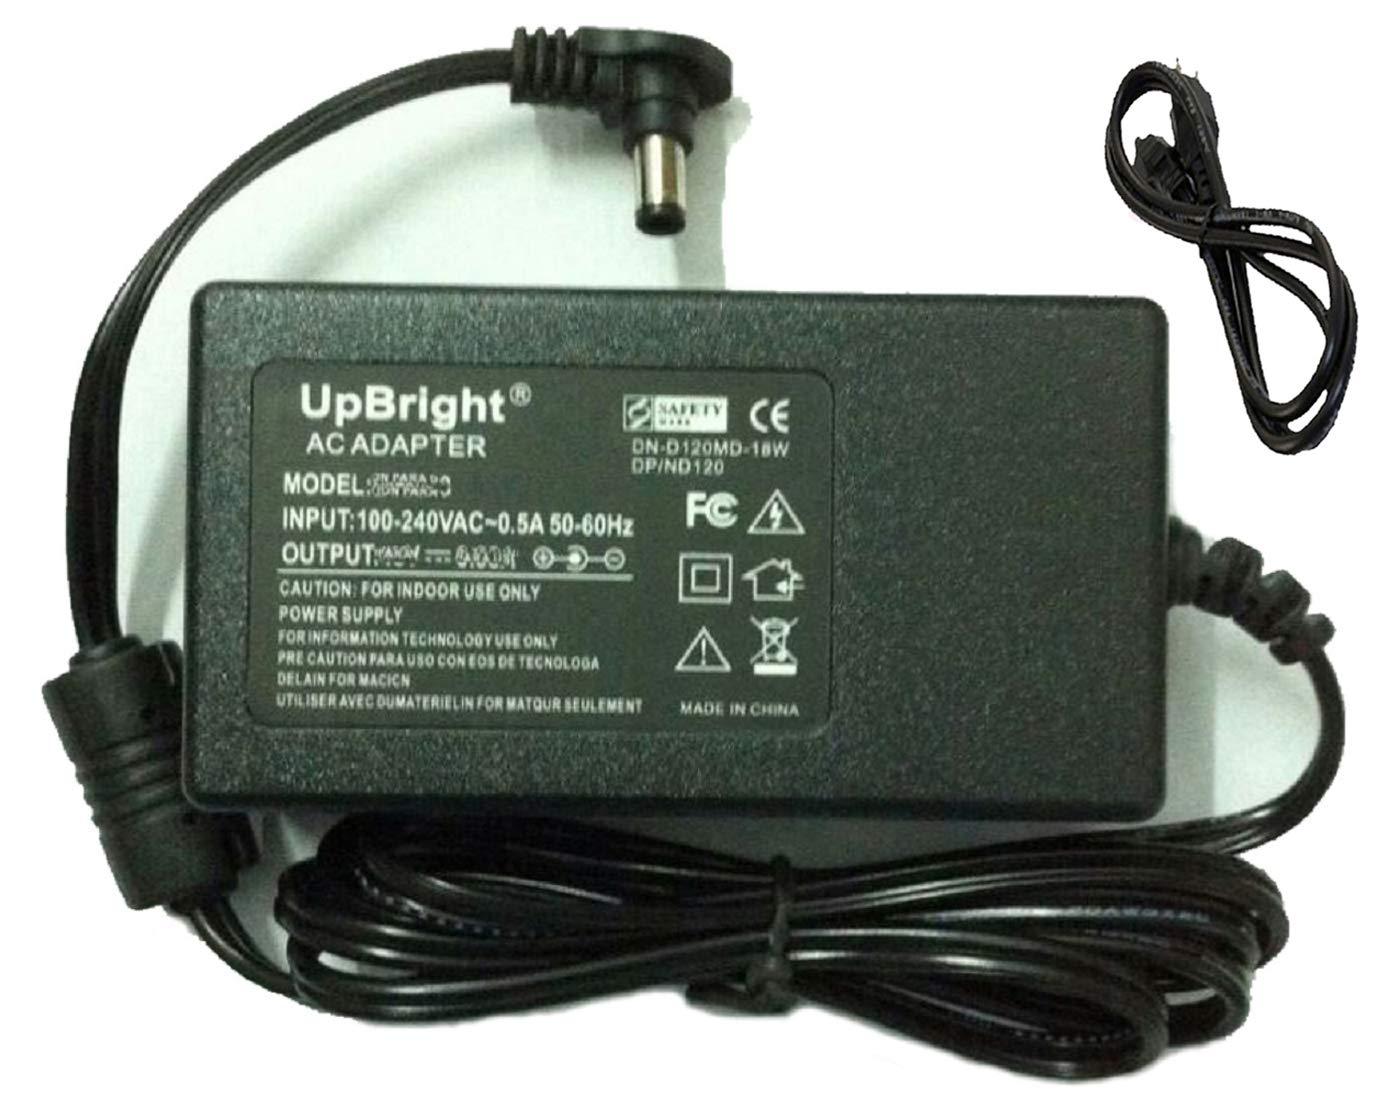 UpBright AC/DC Adapter Replacement Cisco Aironet 1700 1702i 2700 2700i AIR-CAP1702I-A-K9 AIR-CAP1702I-B-K9 AIR-CAP2702I-A-K9 AIR-CAP2702E-B-K9 AIR-CAP2702I-Z-K9 Wireless Access Point Power Supply Cisco 1702i AIR-CAP1702I-A-K9